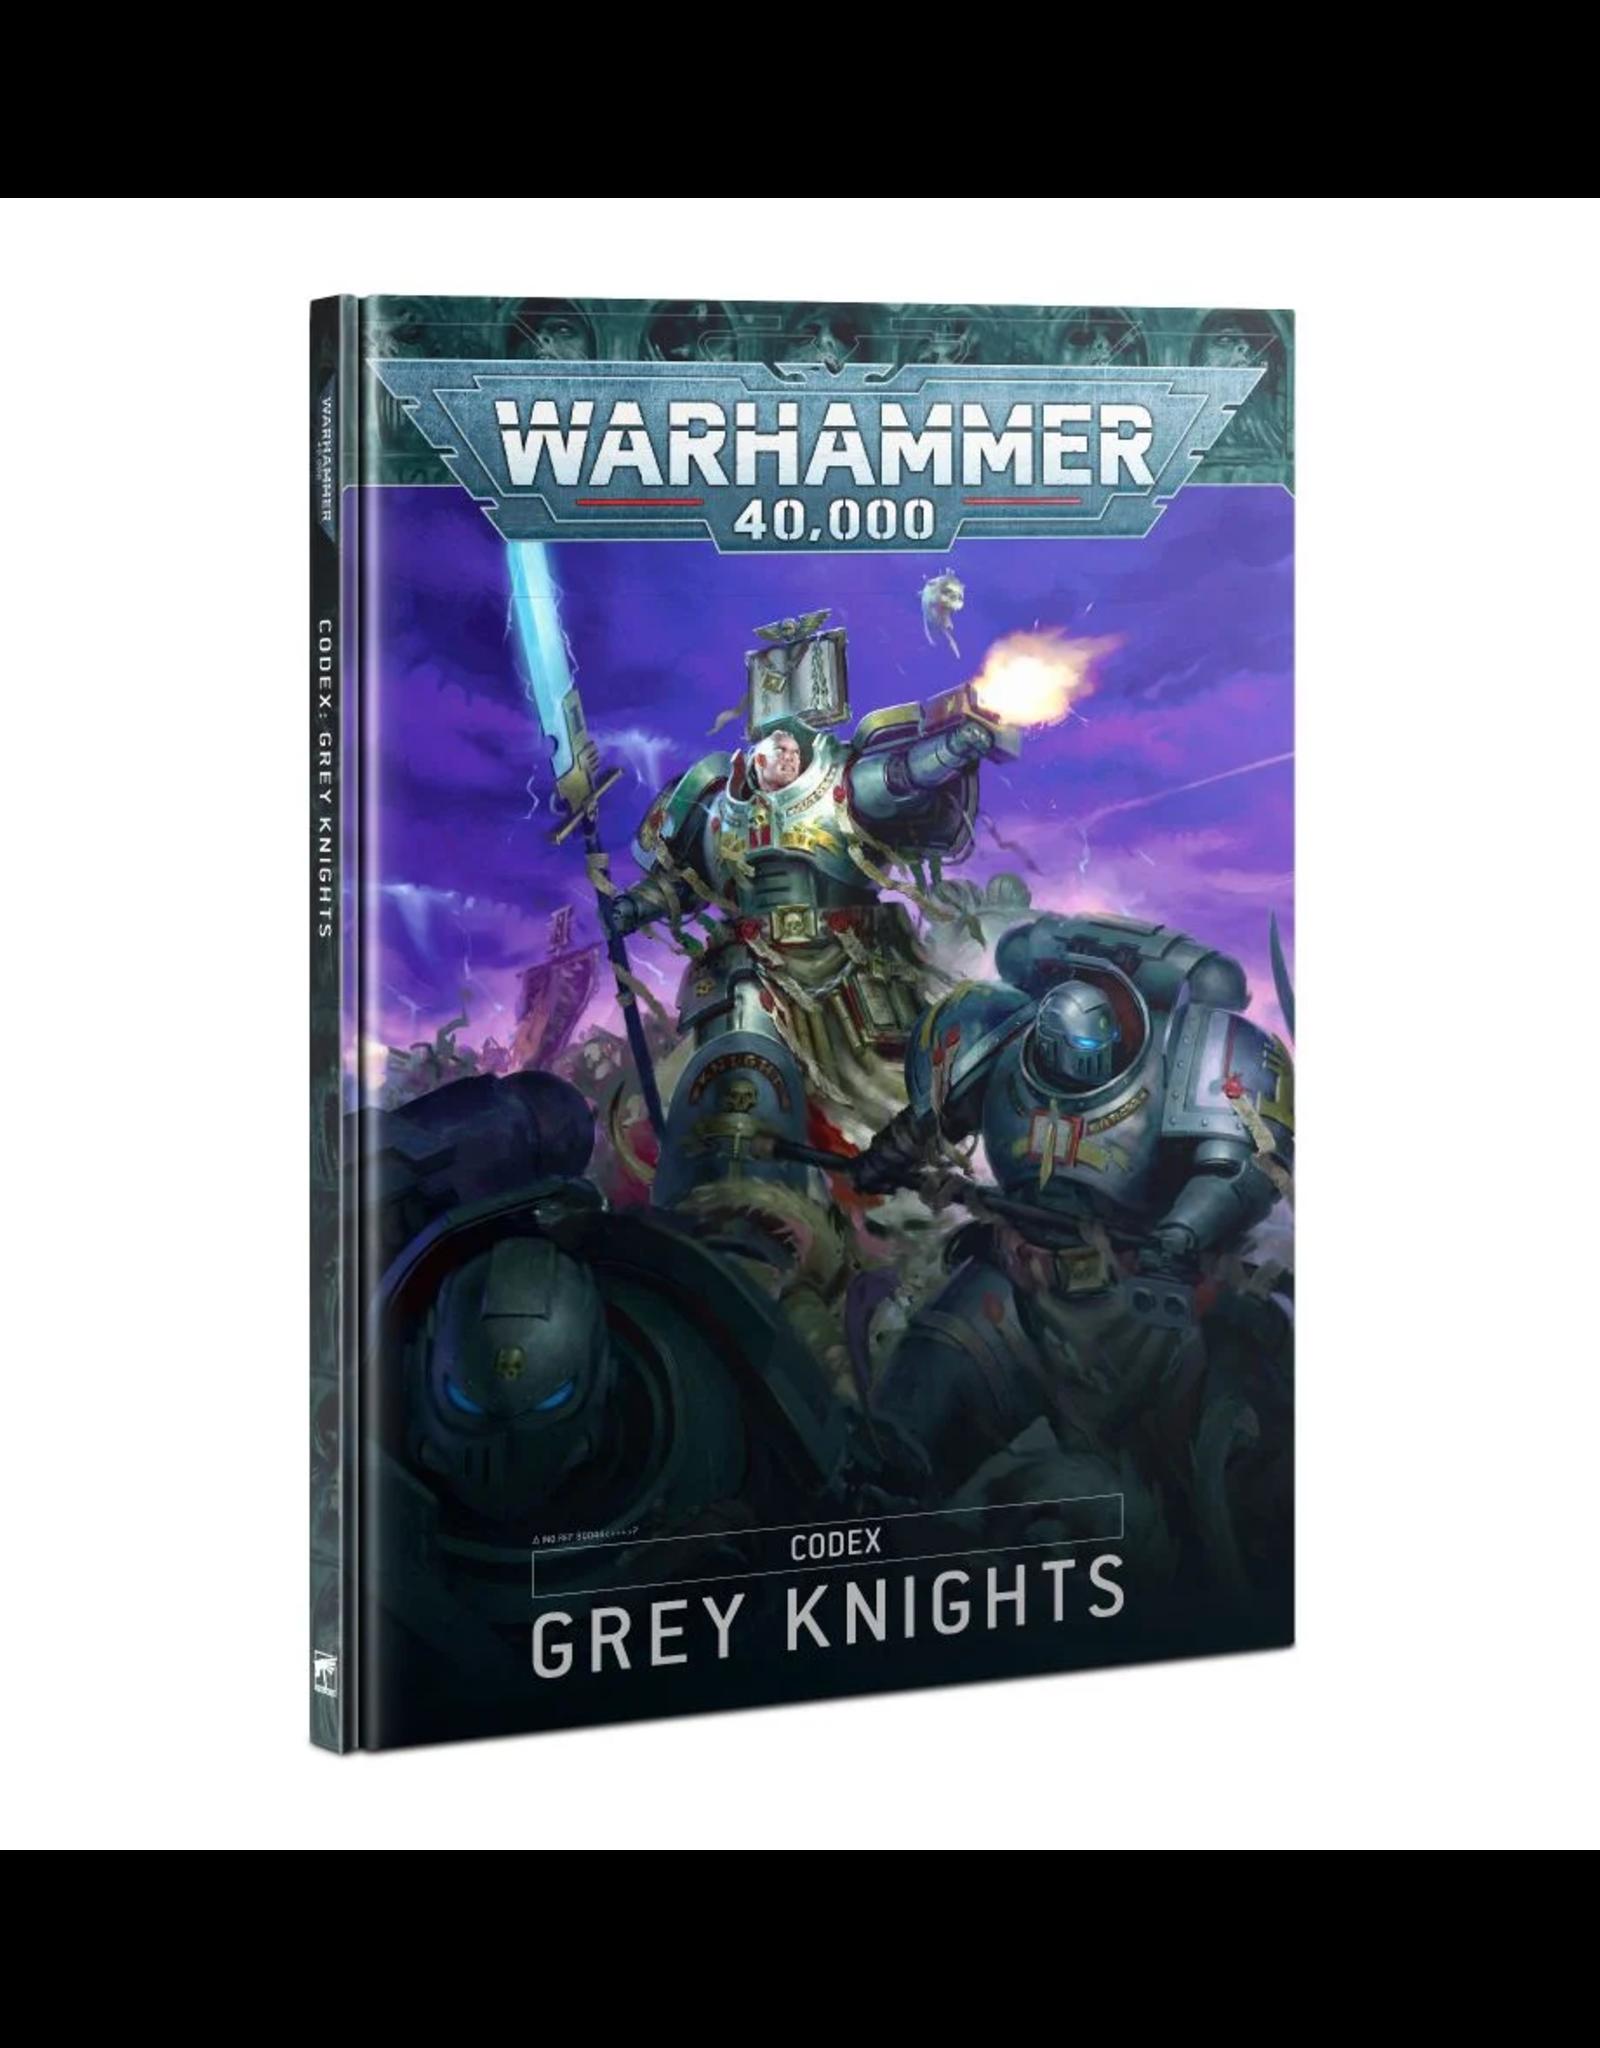 Games Workshop WH40k Codex: Grey Knights 9th